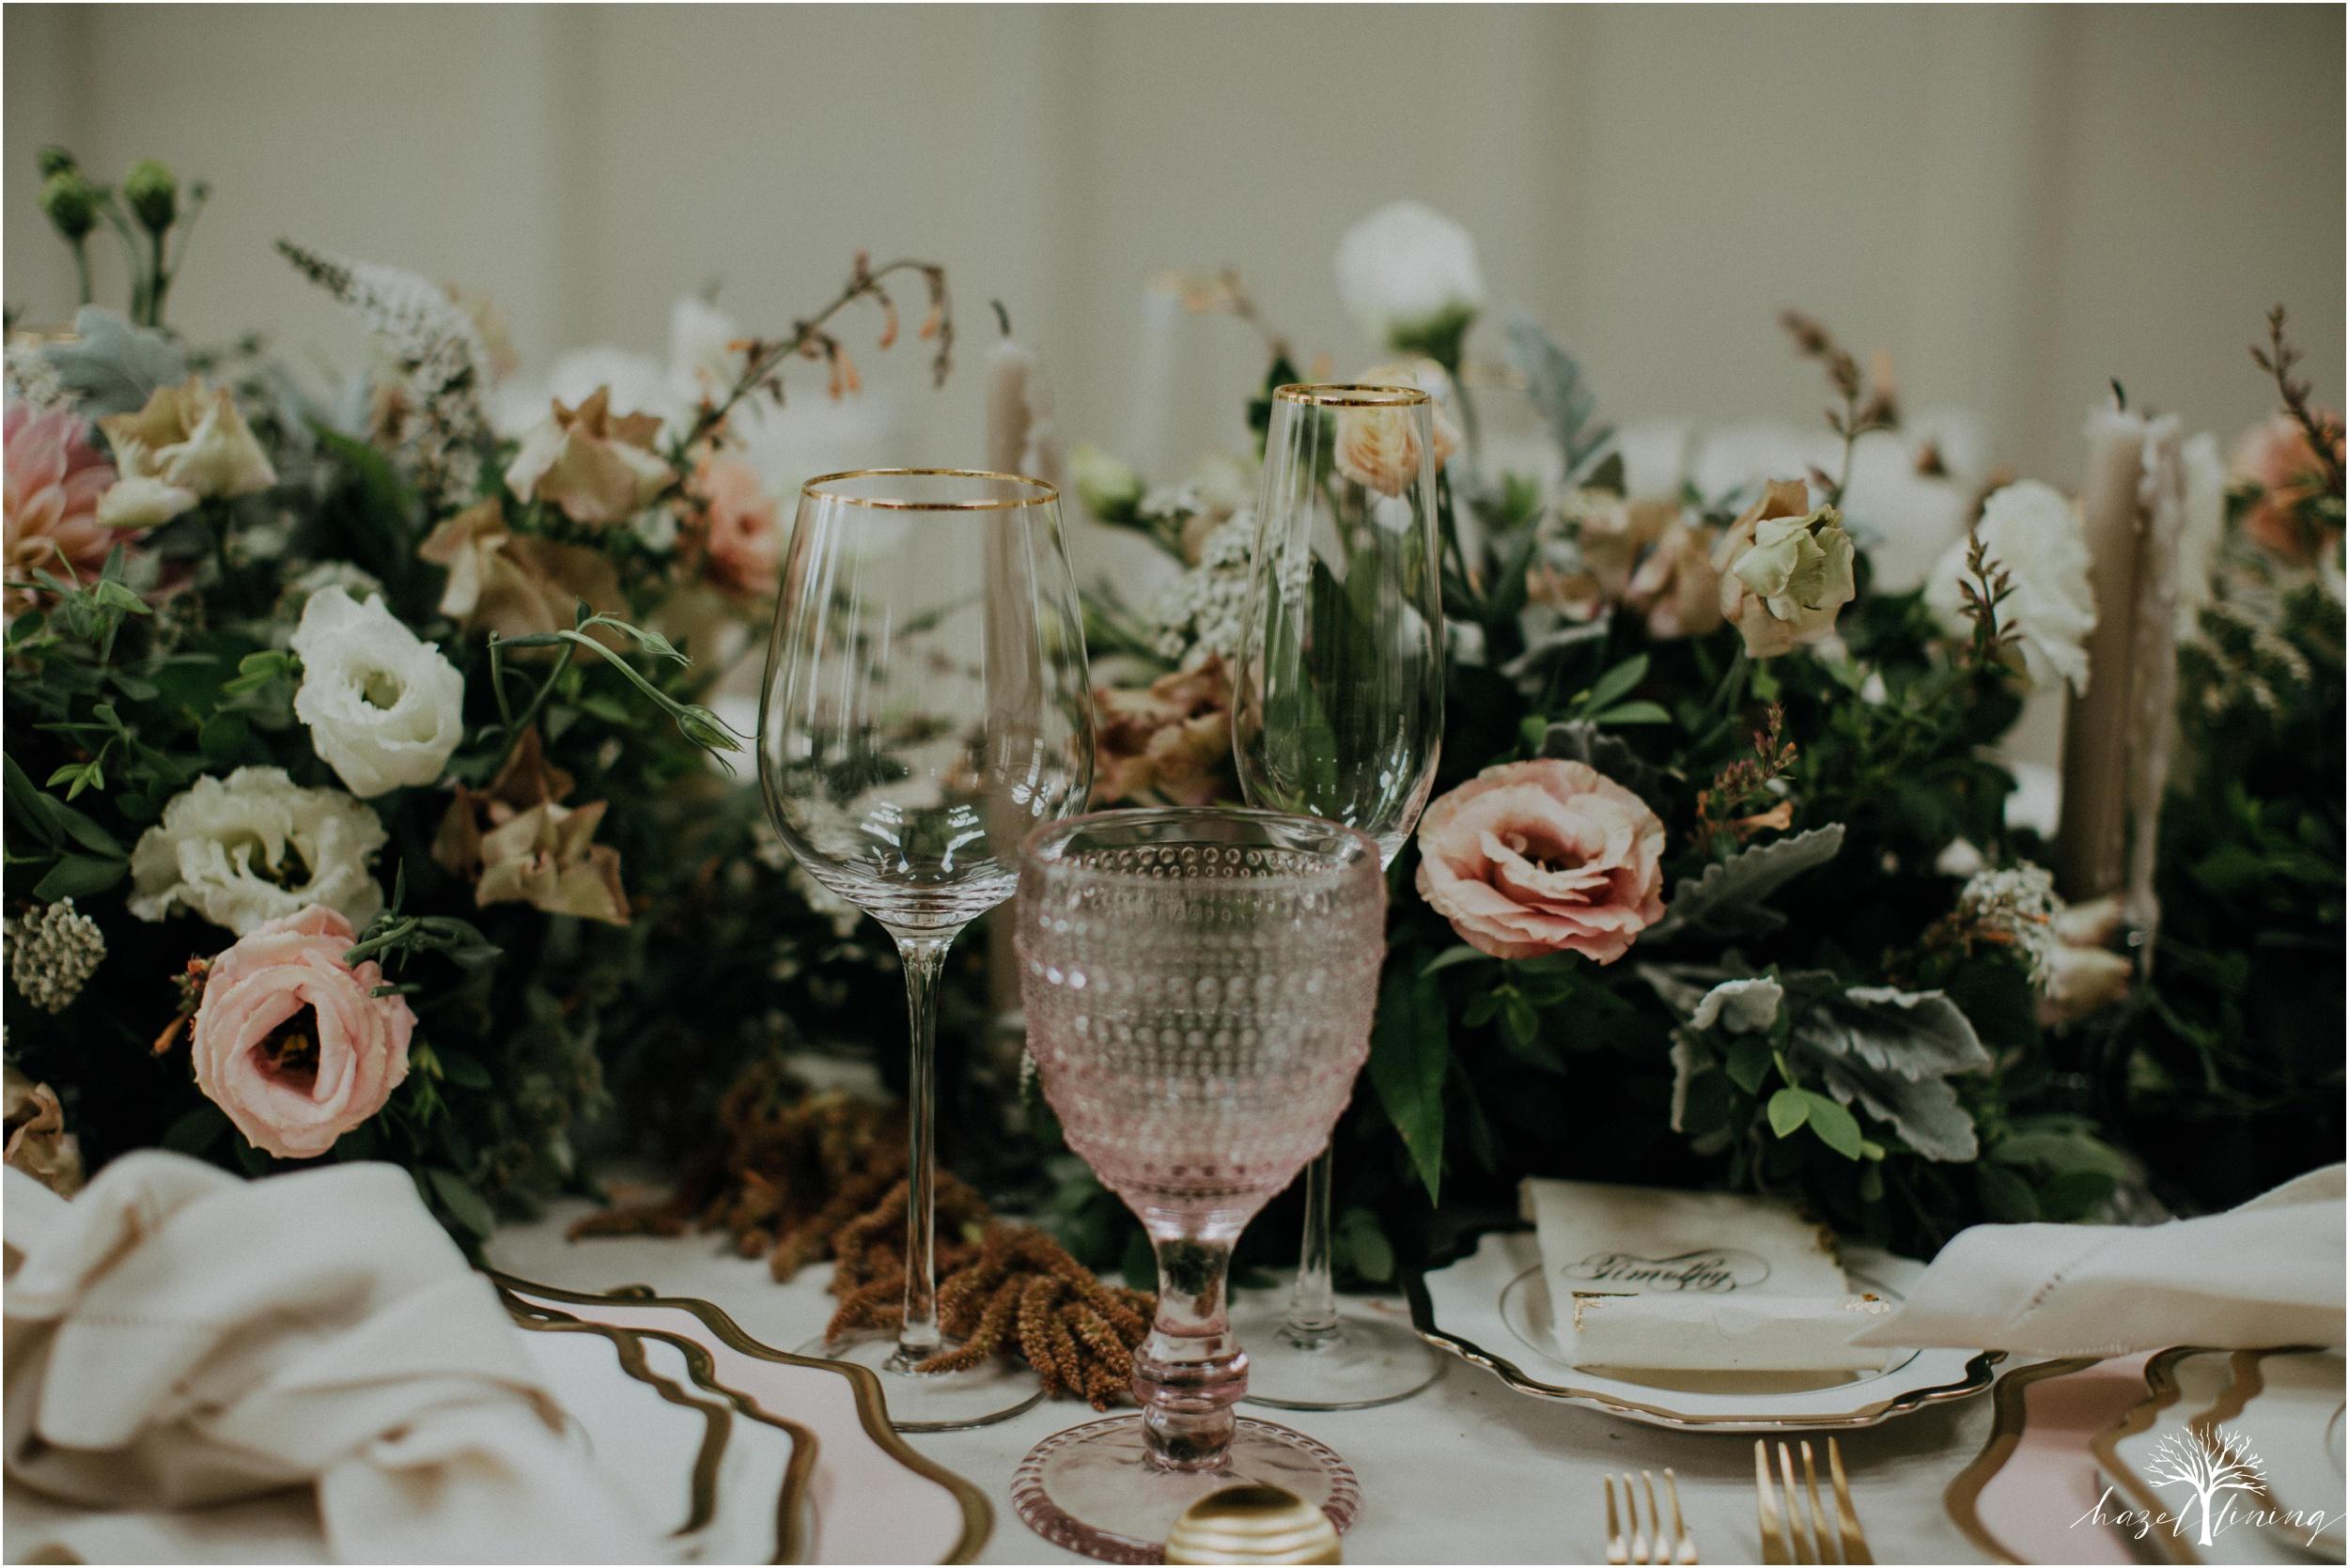 carl-chloe-the-ryland-inn-whitehouse-station-new-jersey-styled-squad-hazel-lining-photography-destination-elopement-wedding-engagement-photography_0012.jpg